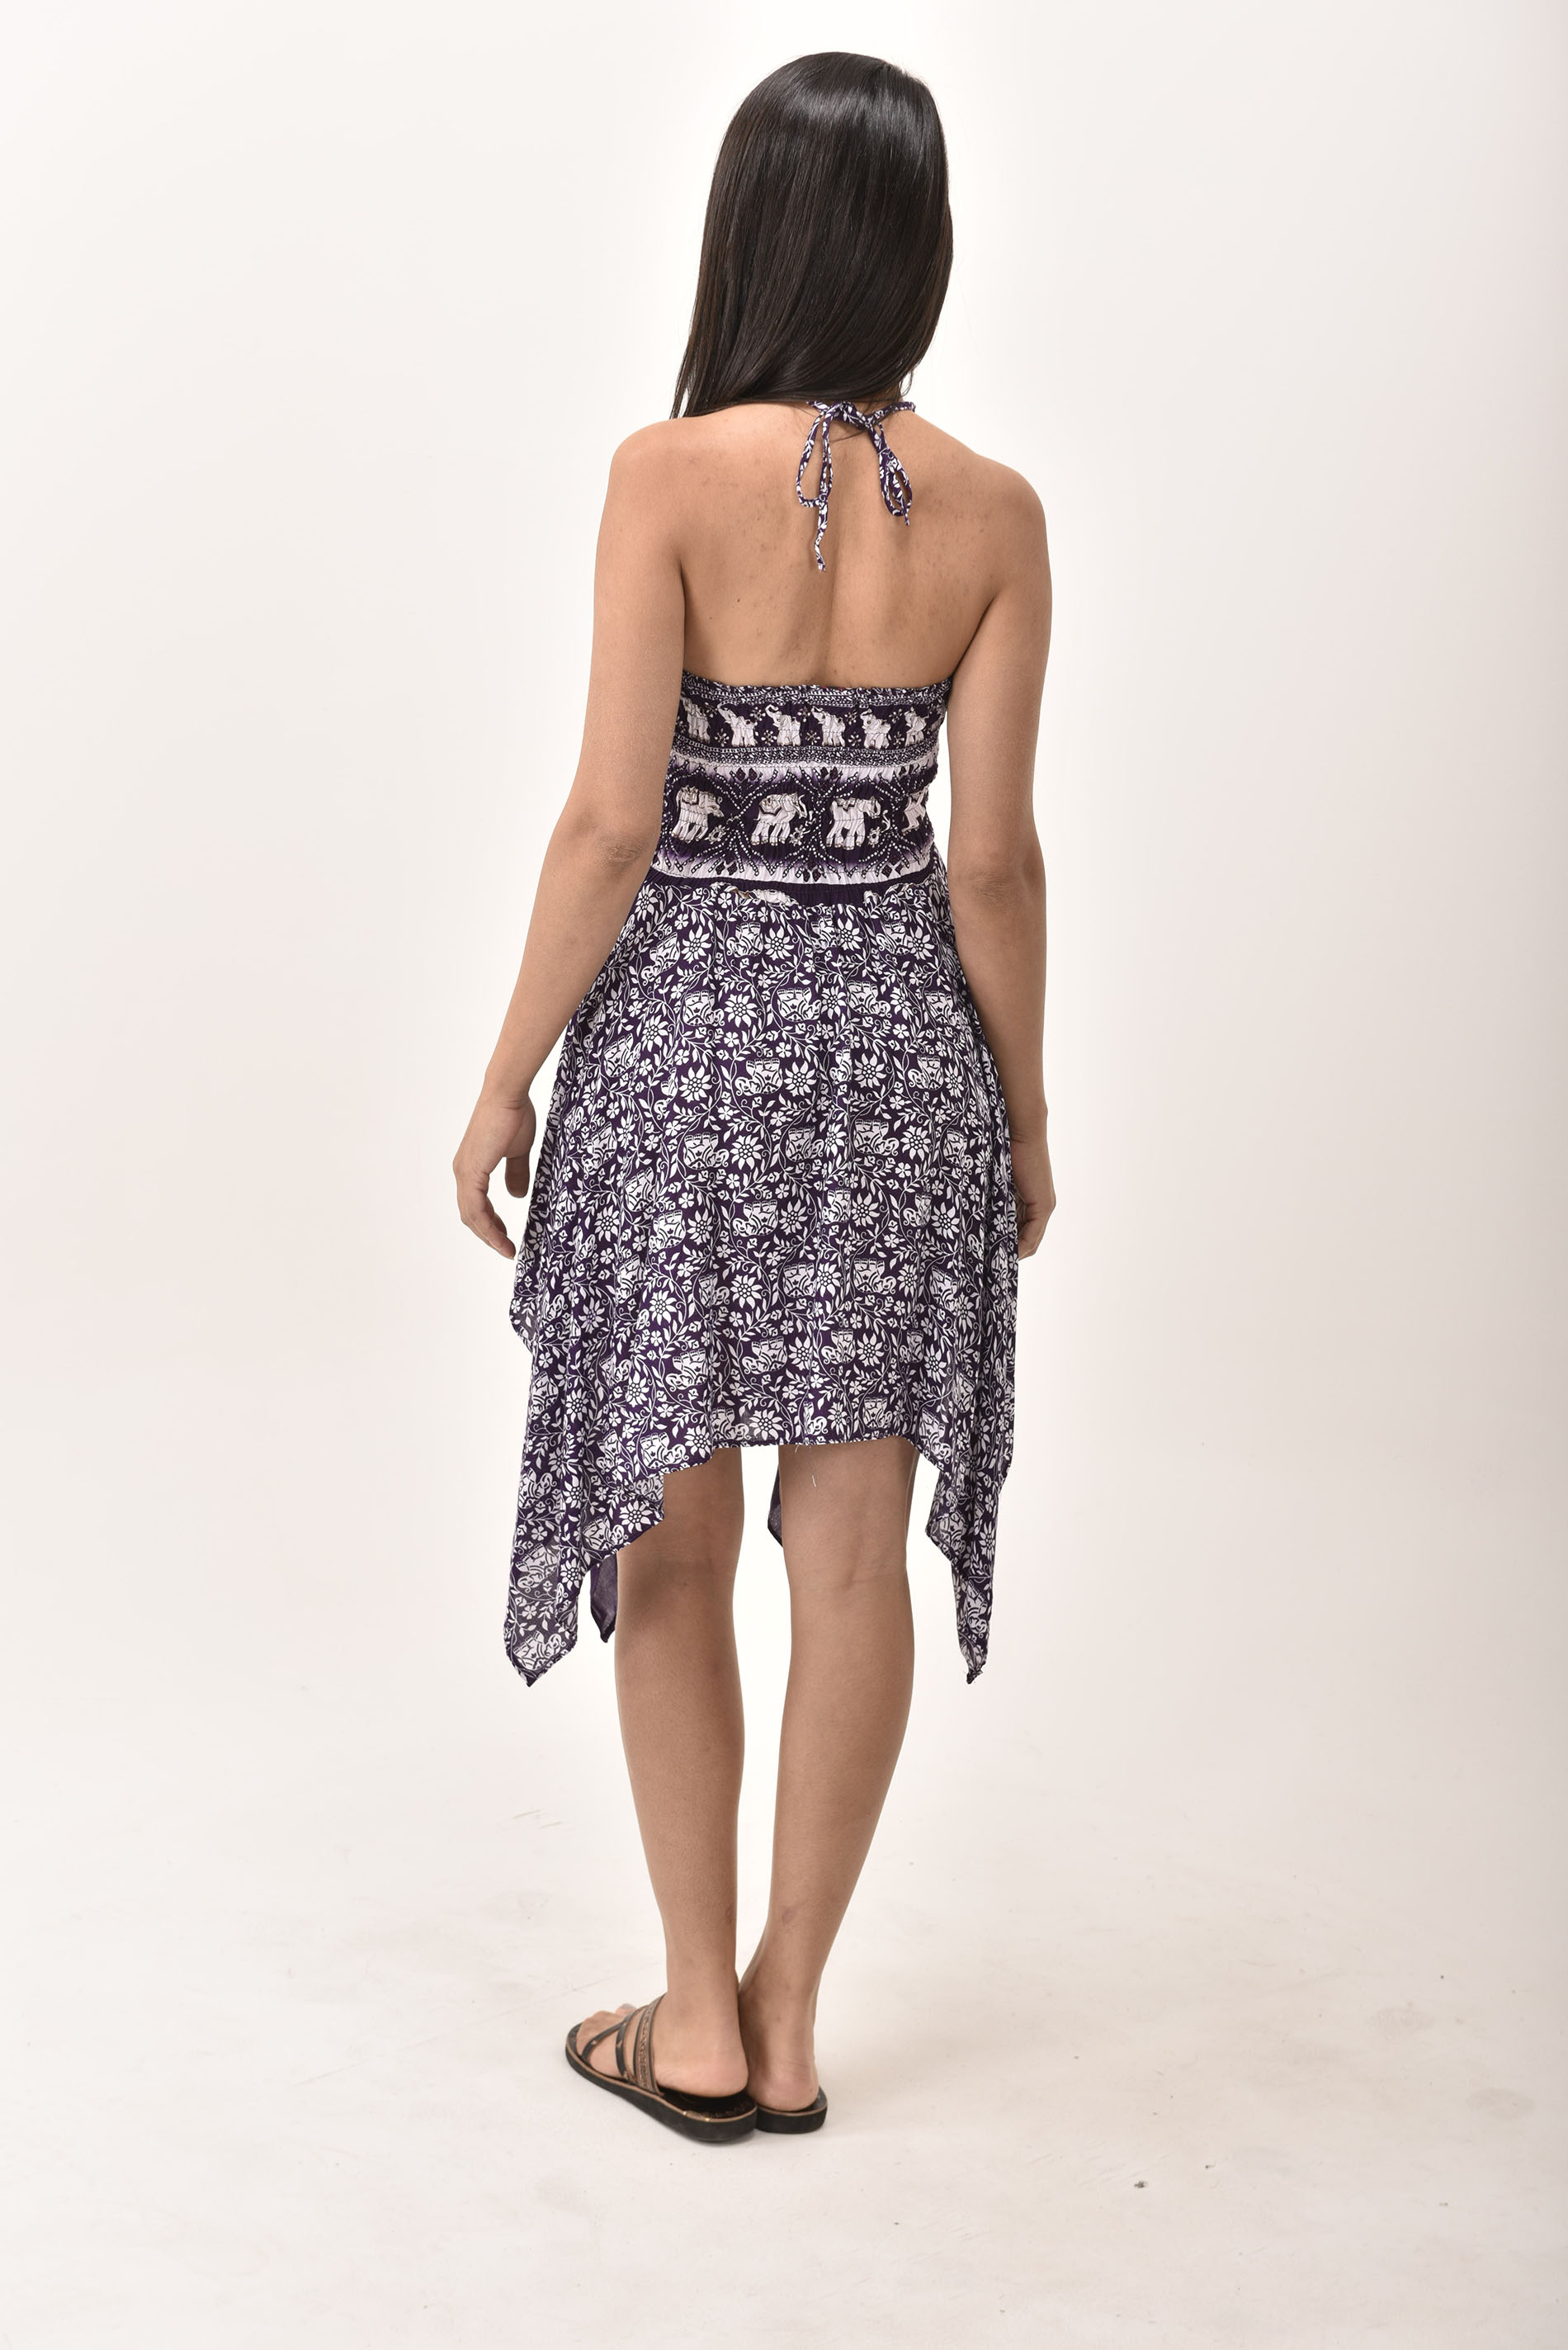 Elephant Print Rayon Fairy Dress / Skirt Purple